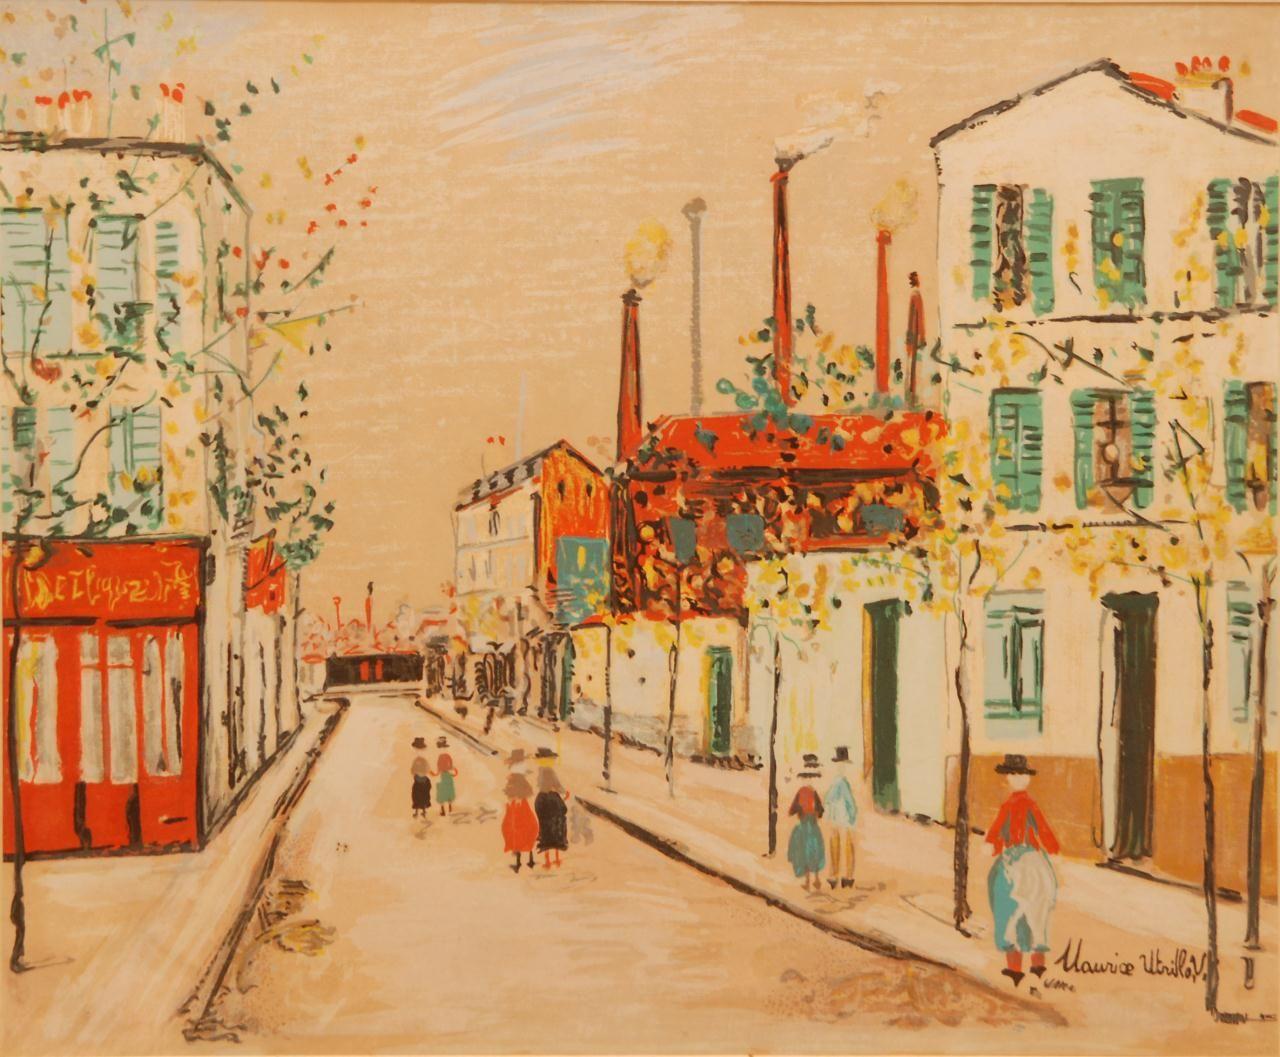 utrillo paintings | 109 maurice utrillo original street scene gouache maurice utrillo ...